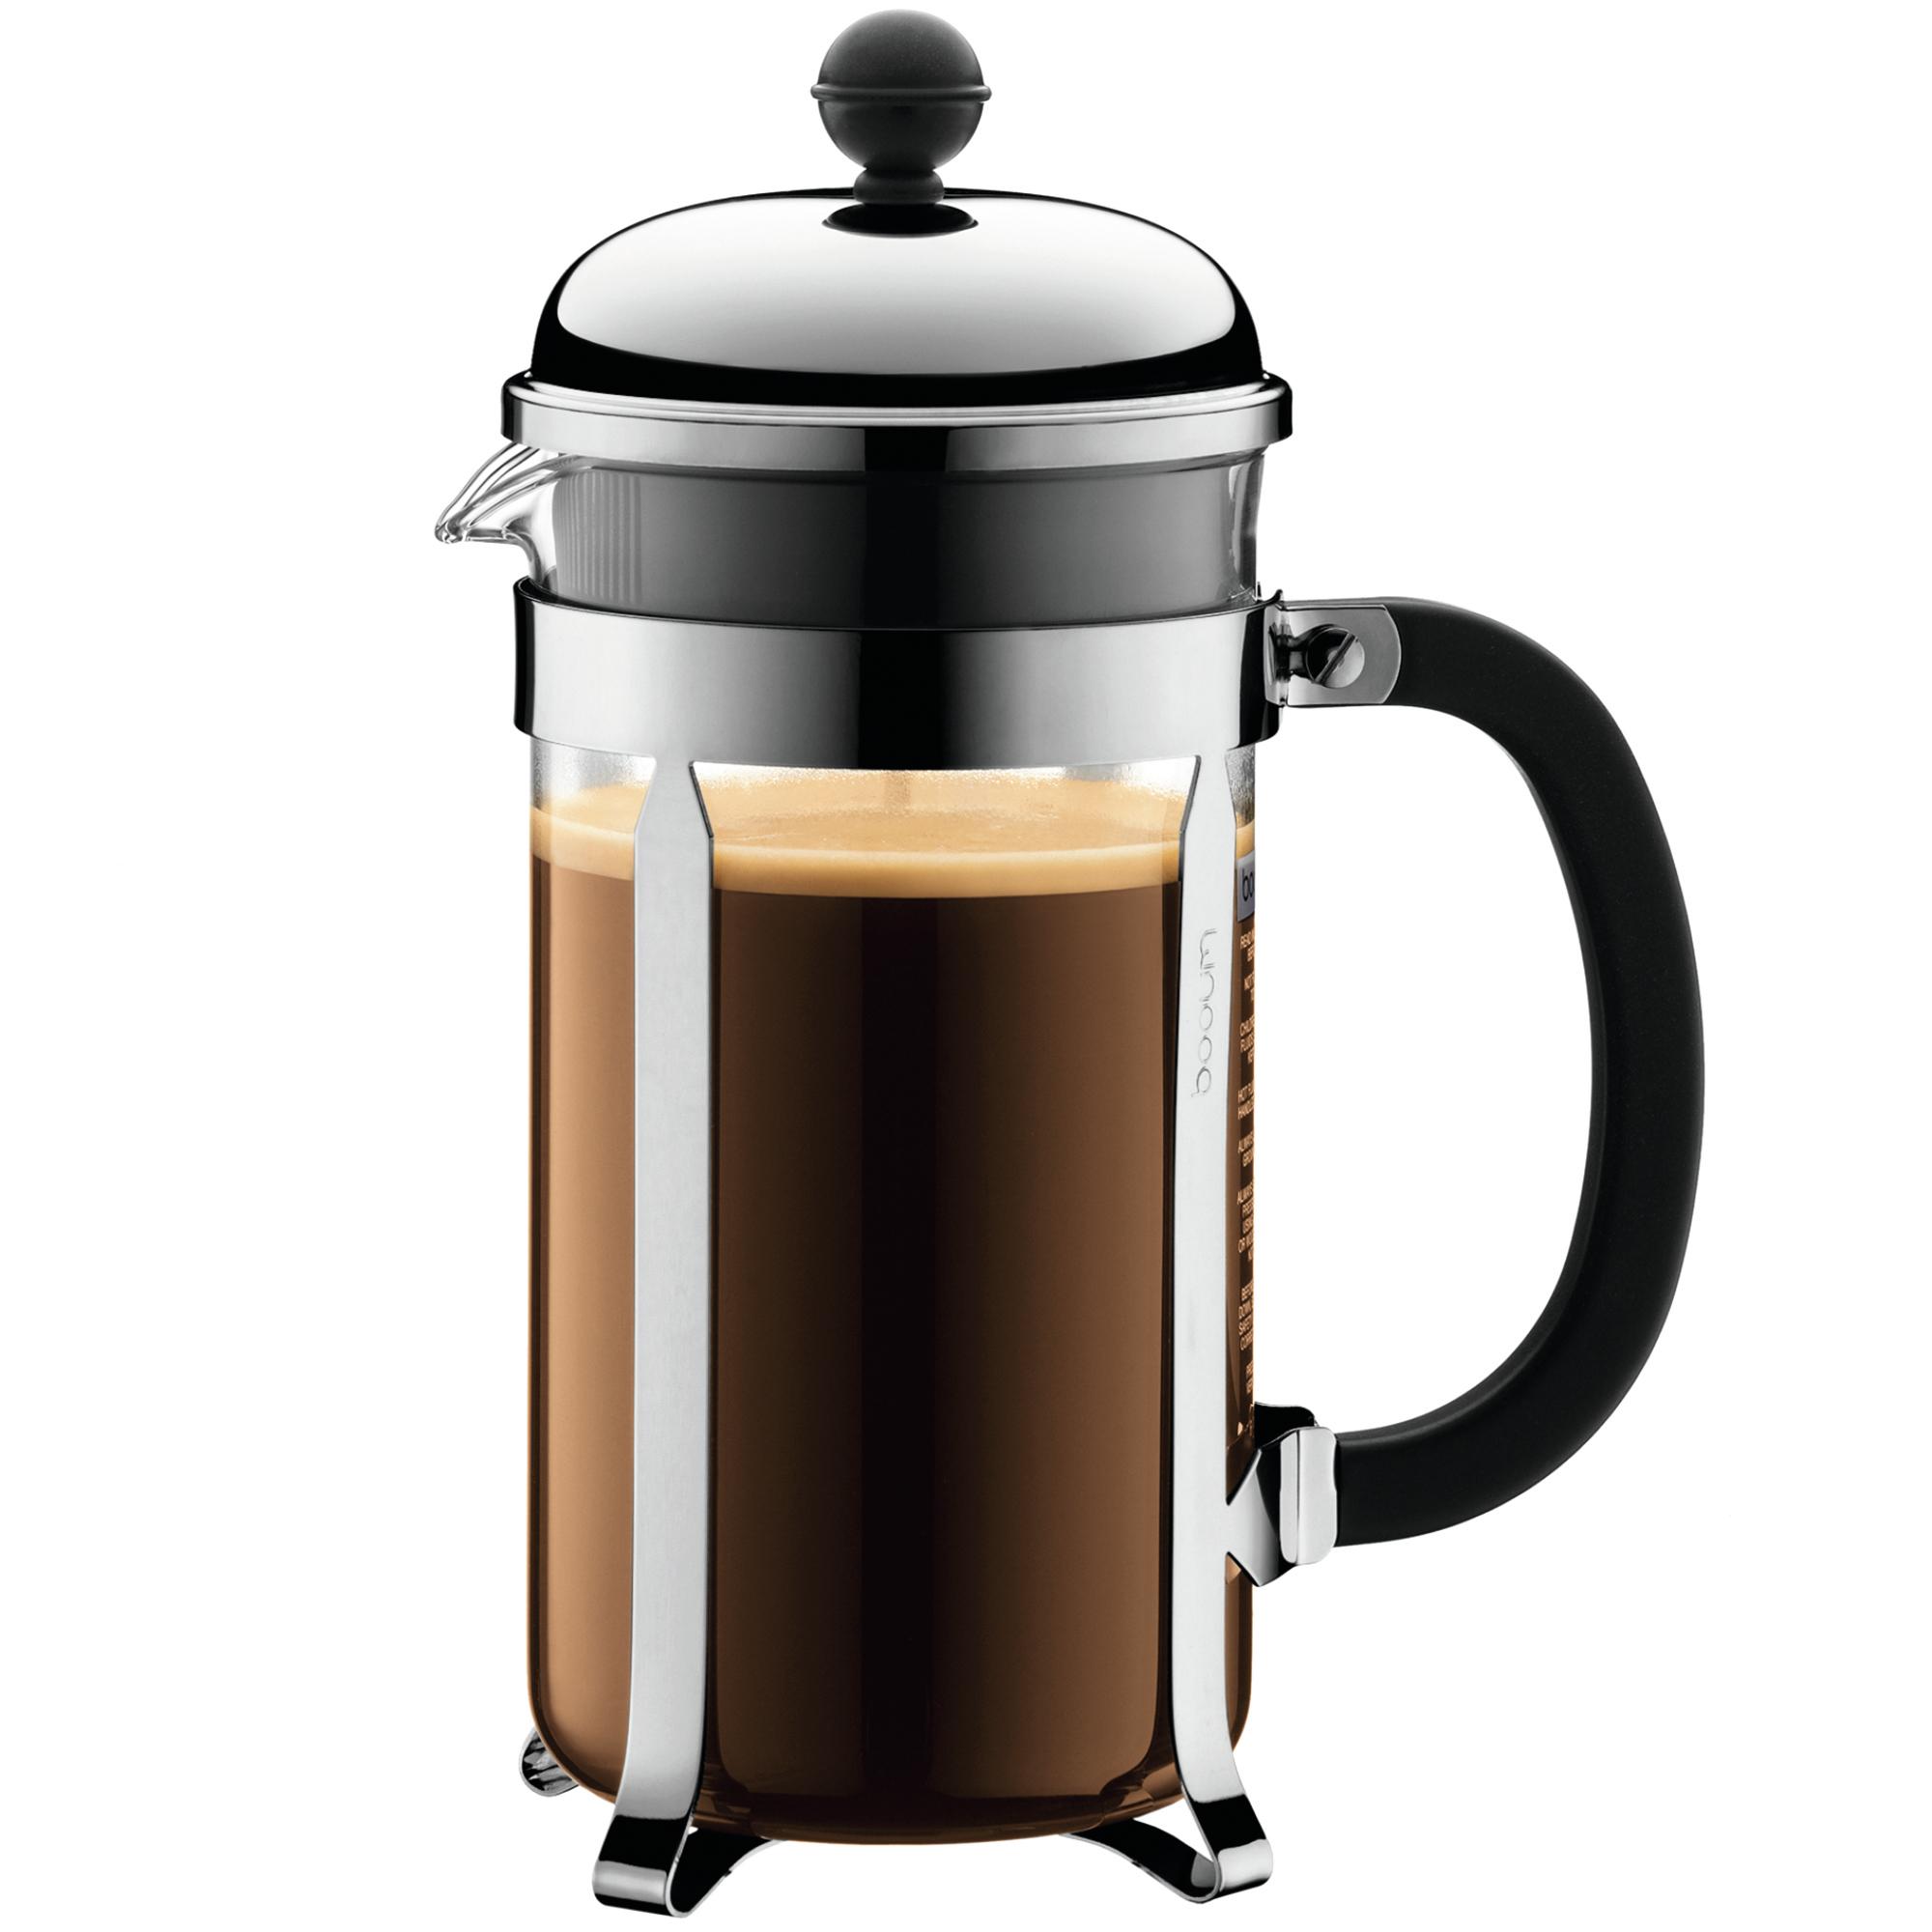 Chambord Coffee Maker 8 cups